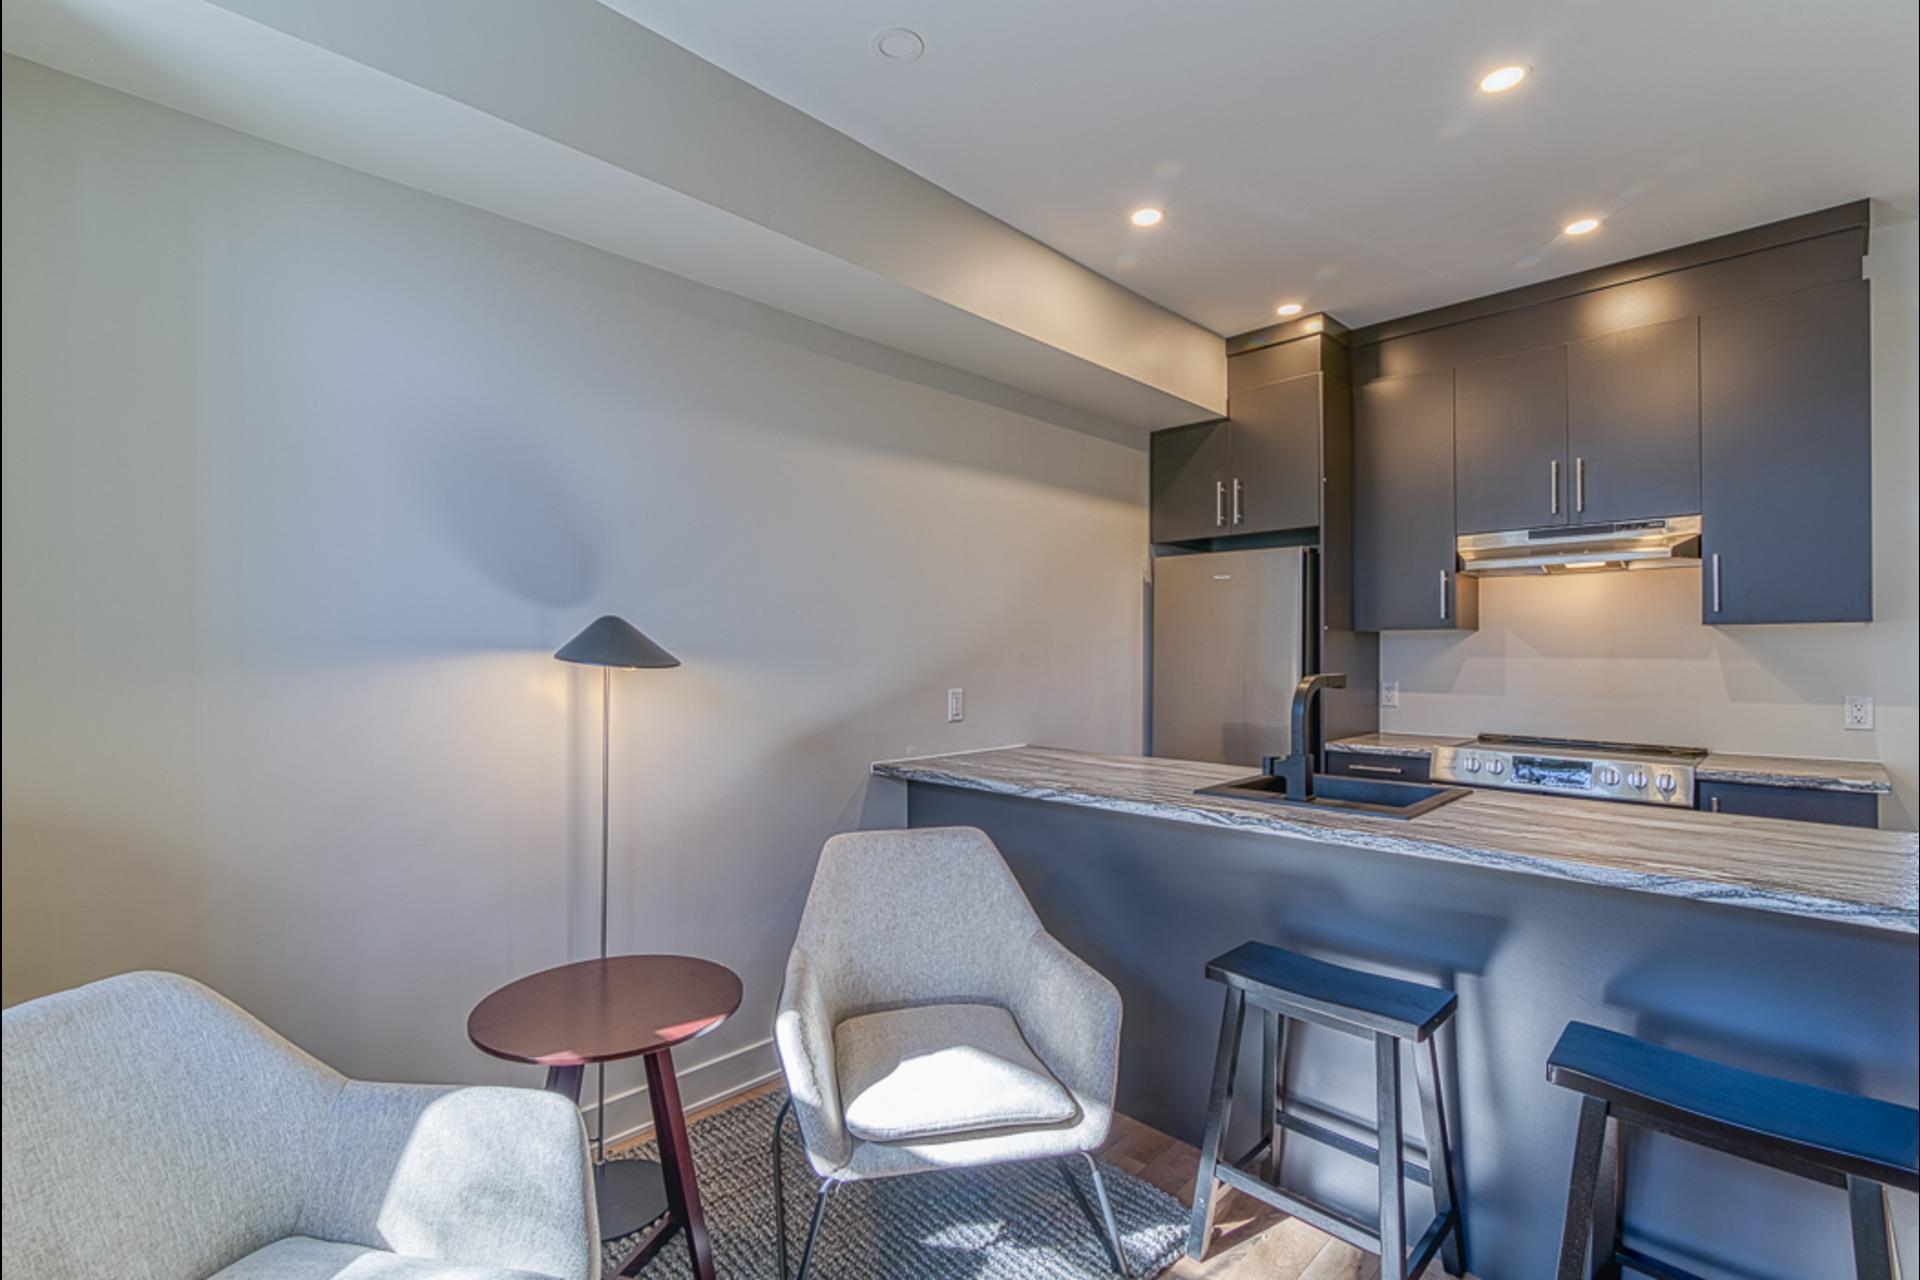 image 18 - Furnished Appartement For rent Montréal - 3 rooms